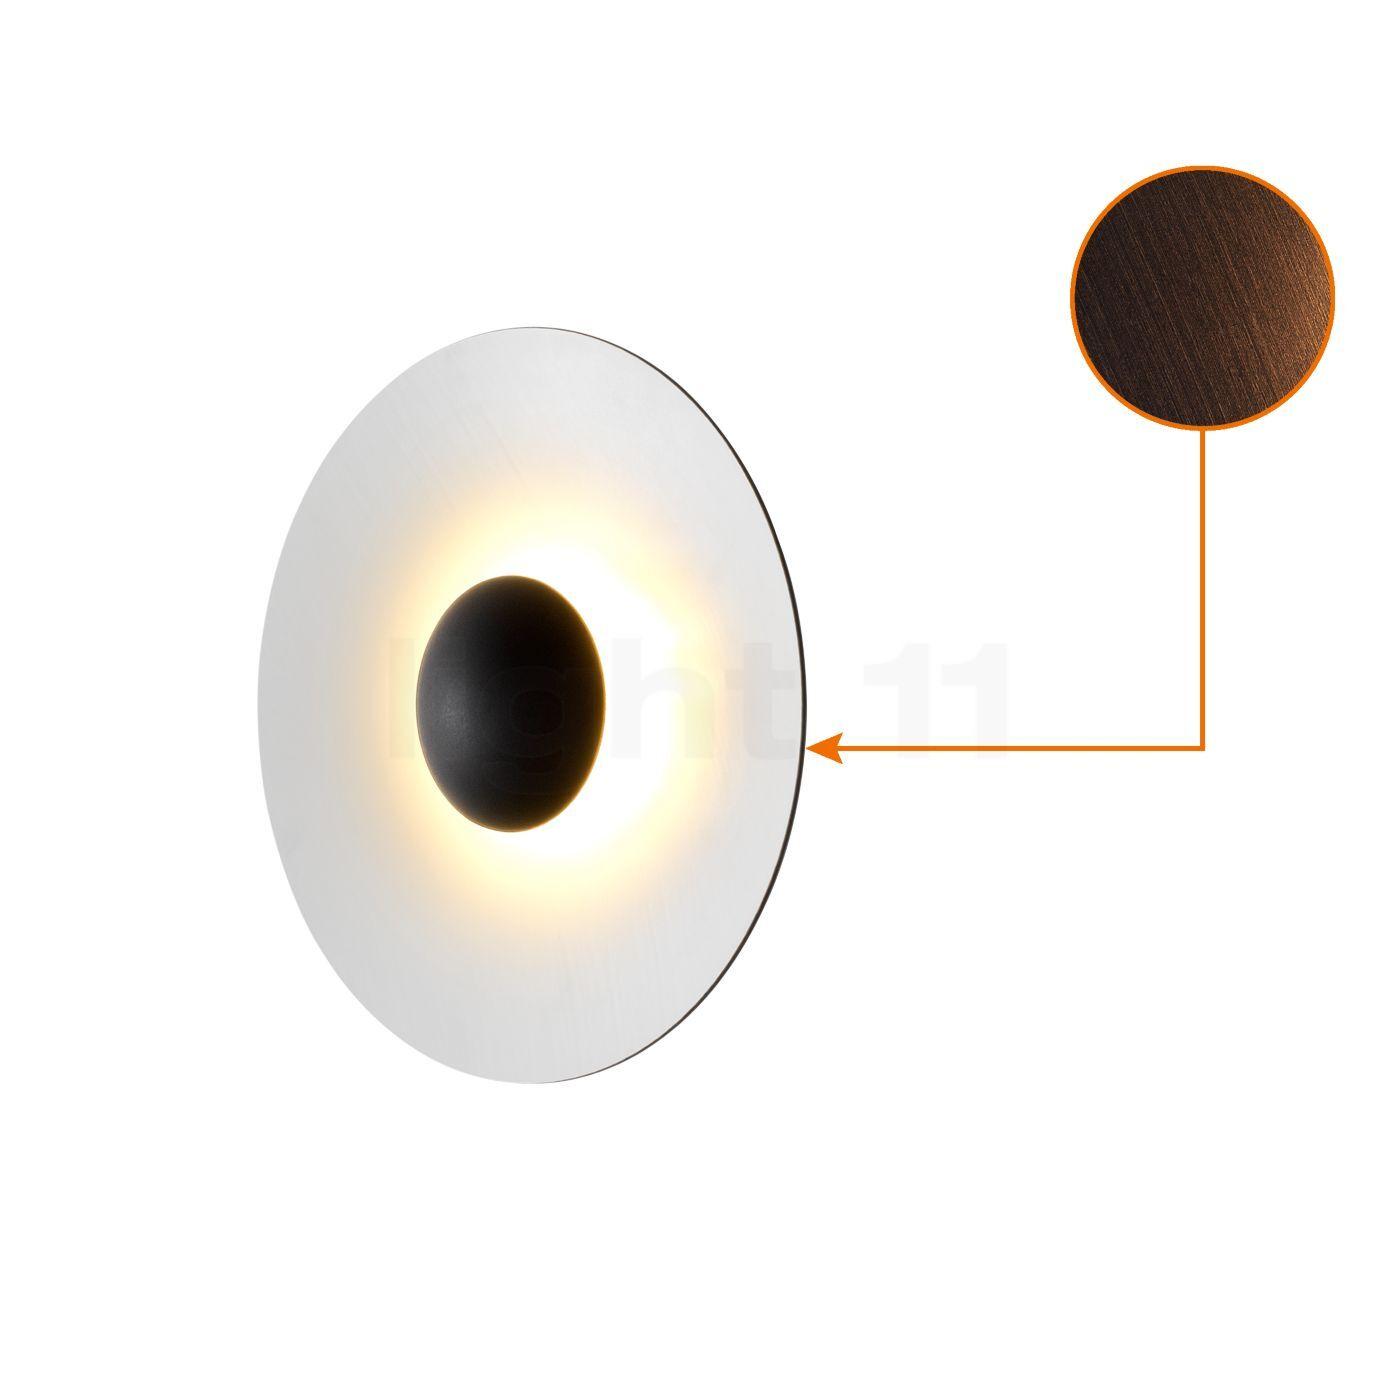 Marset Ginger 32 Applique/Plafonnier LED, wenge/blanc